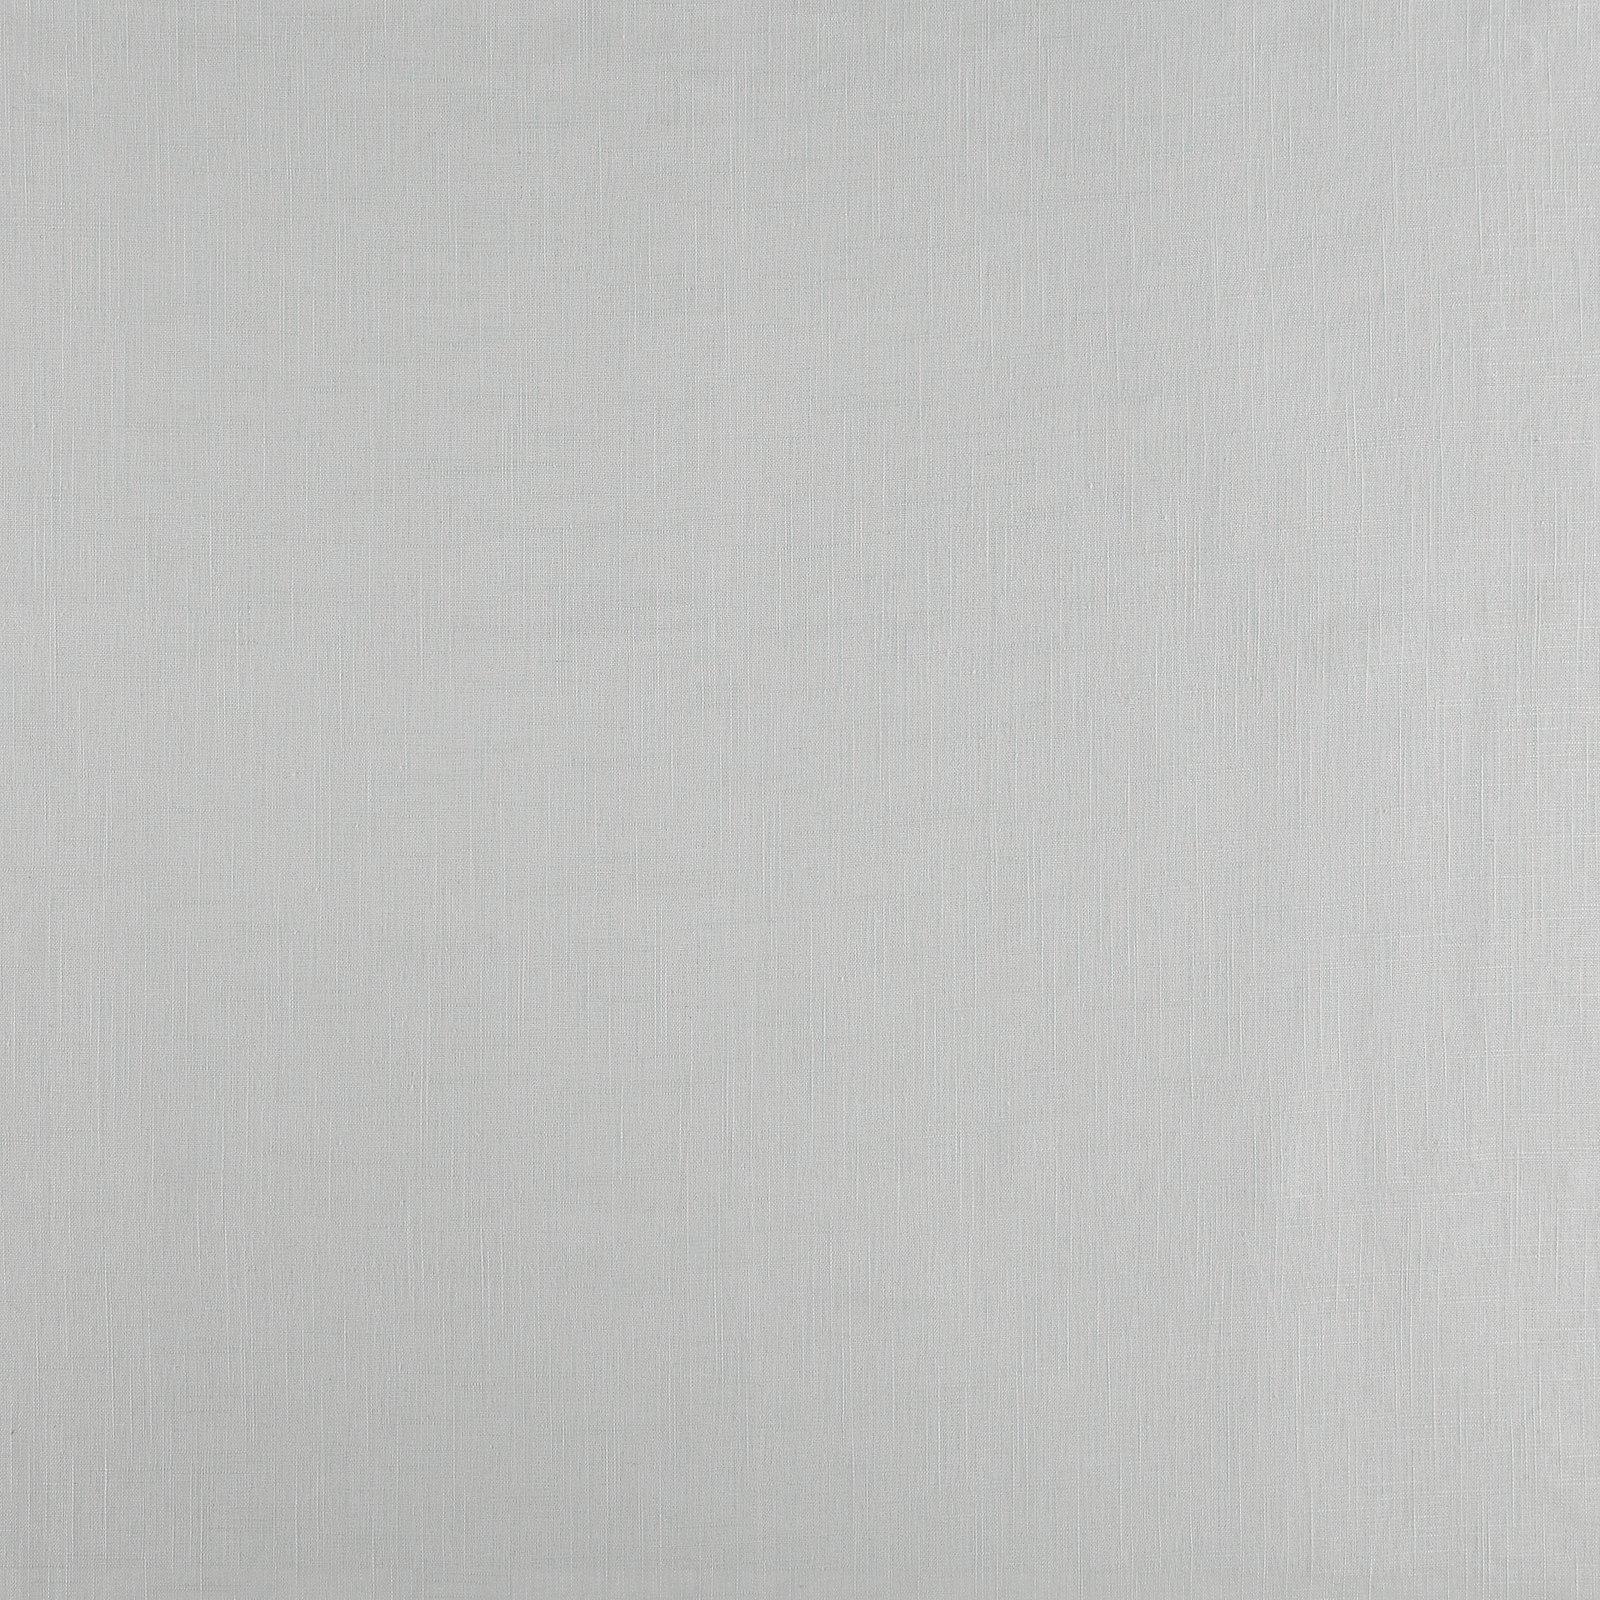 Coarse linen/viscose light grey 852331_pack_solid